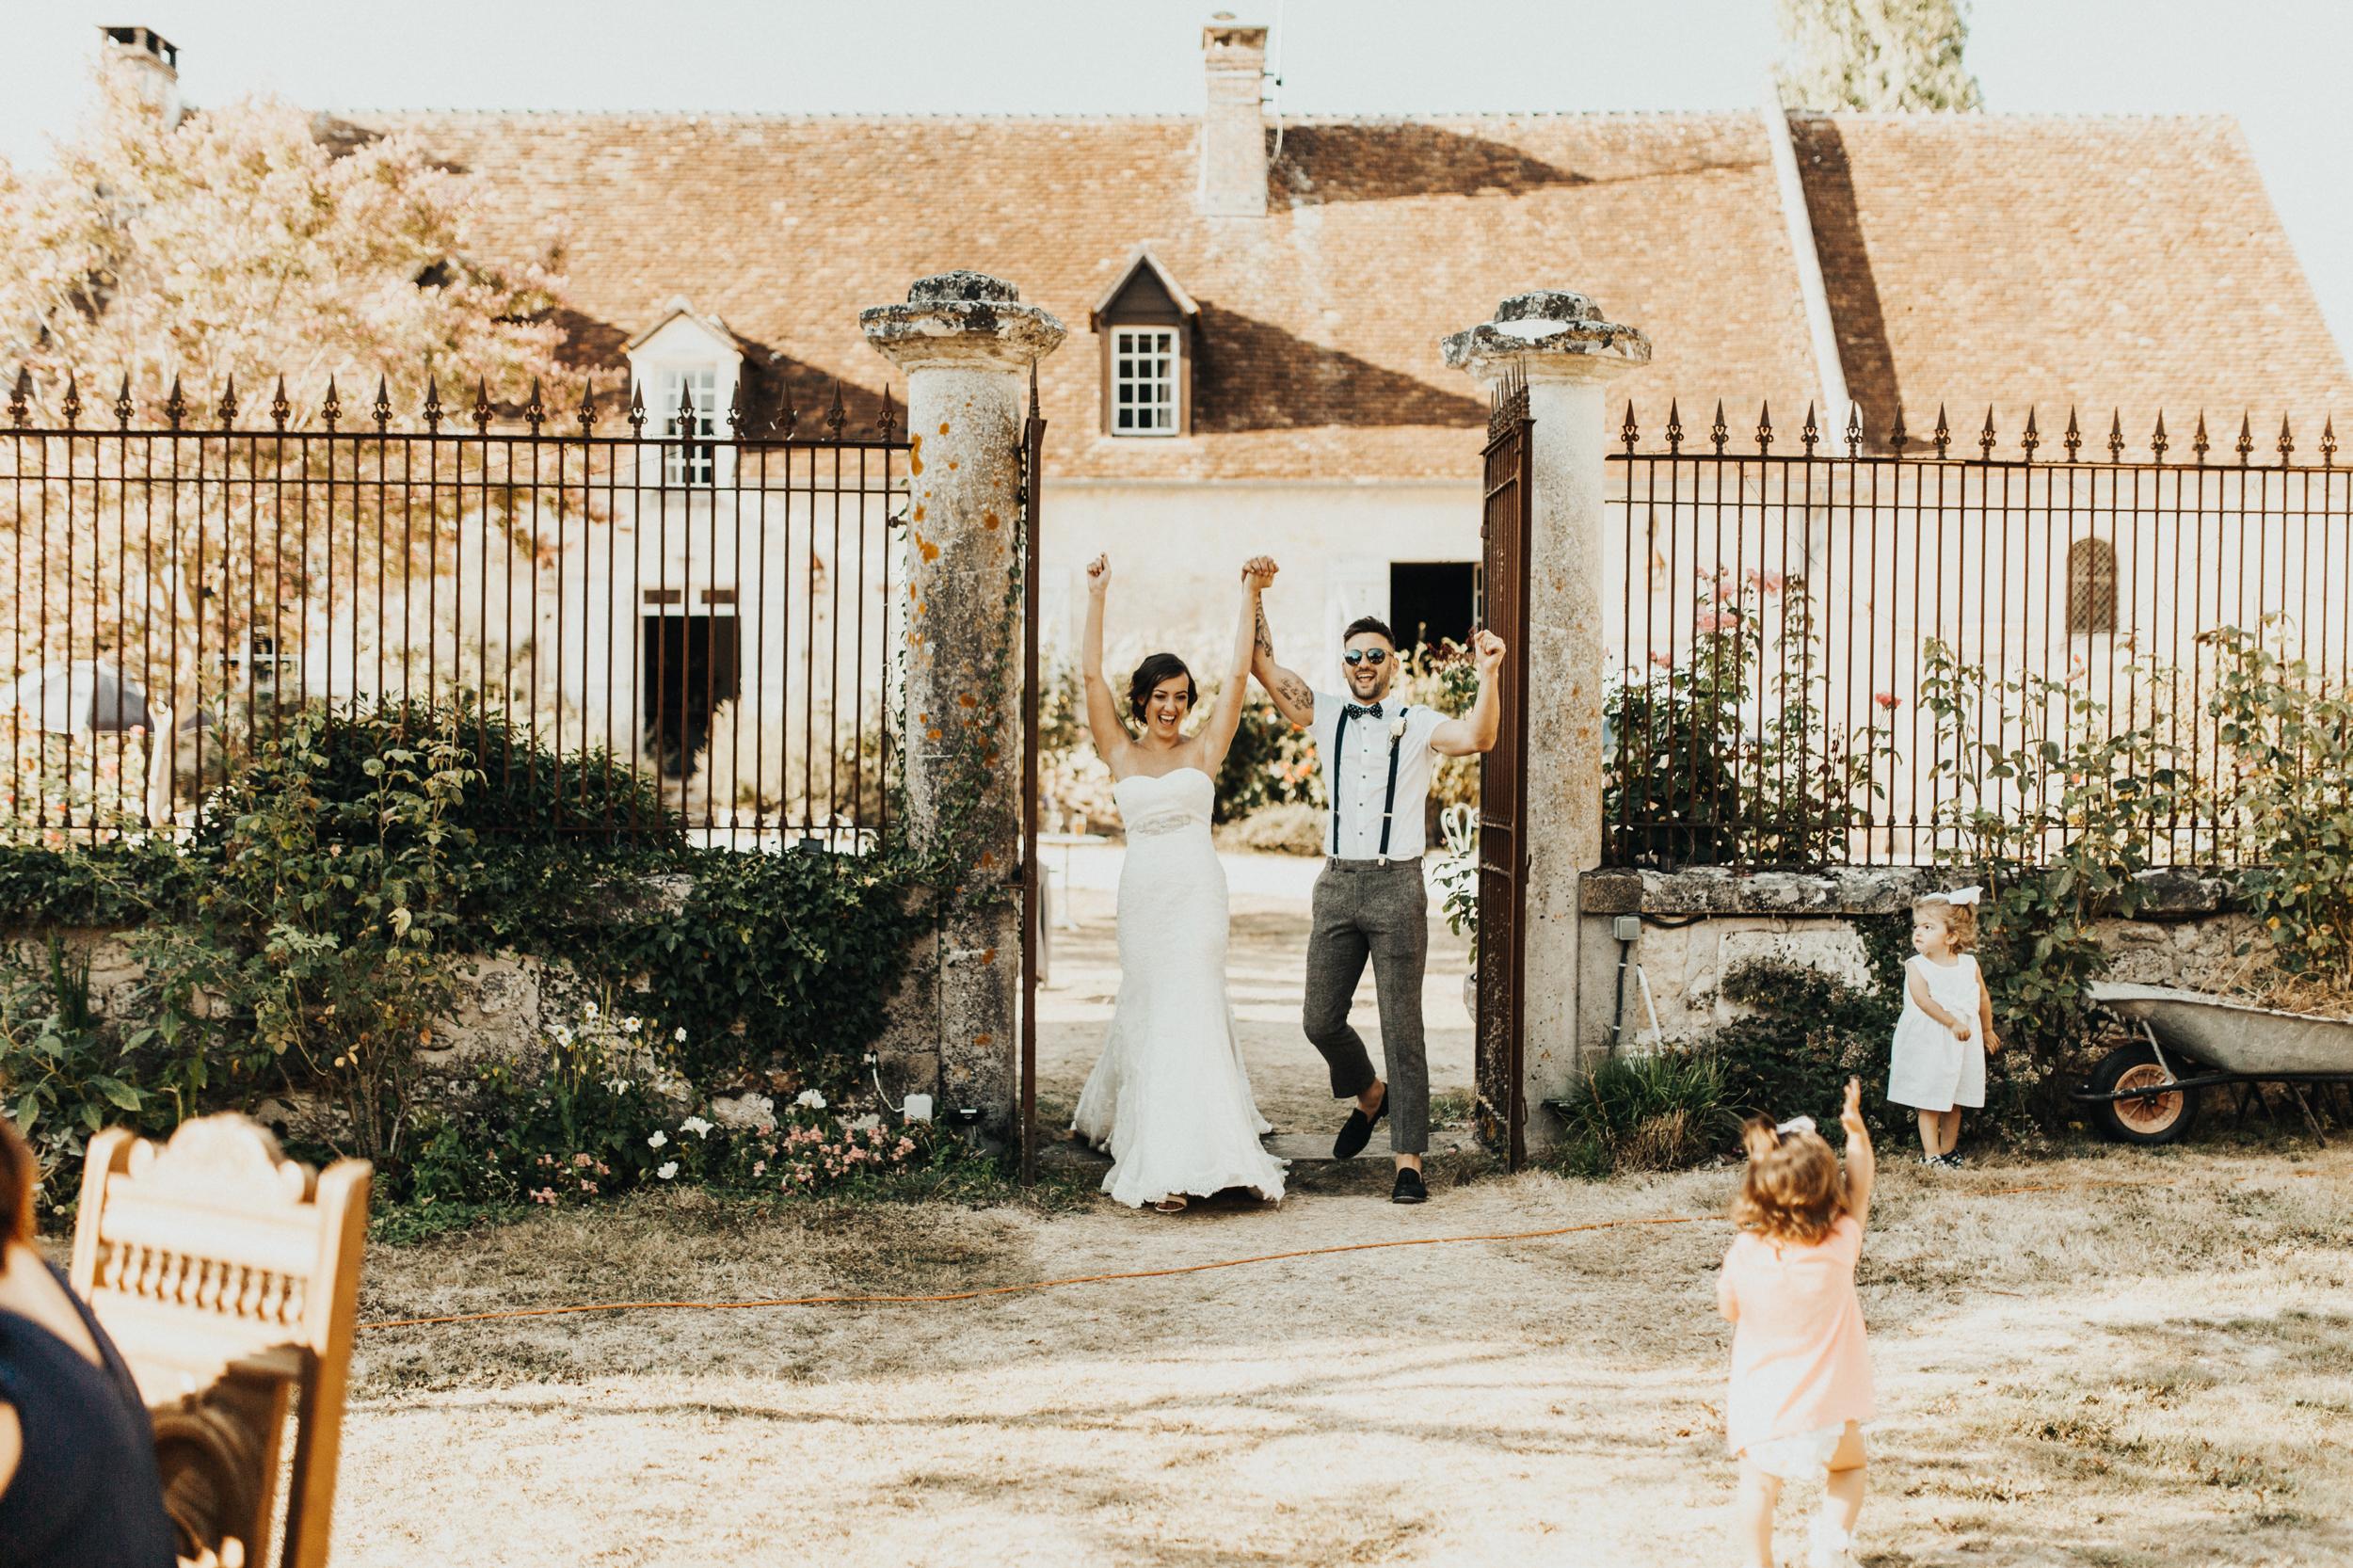 Amy-Zac-Destination-Wedding-France-Manoir-Foulquetiere-Darina-Stoda-Photography-75.jpg